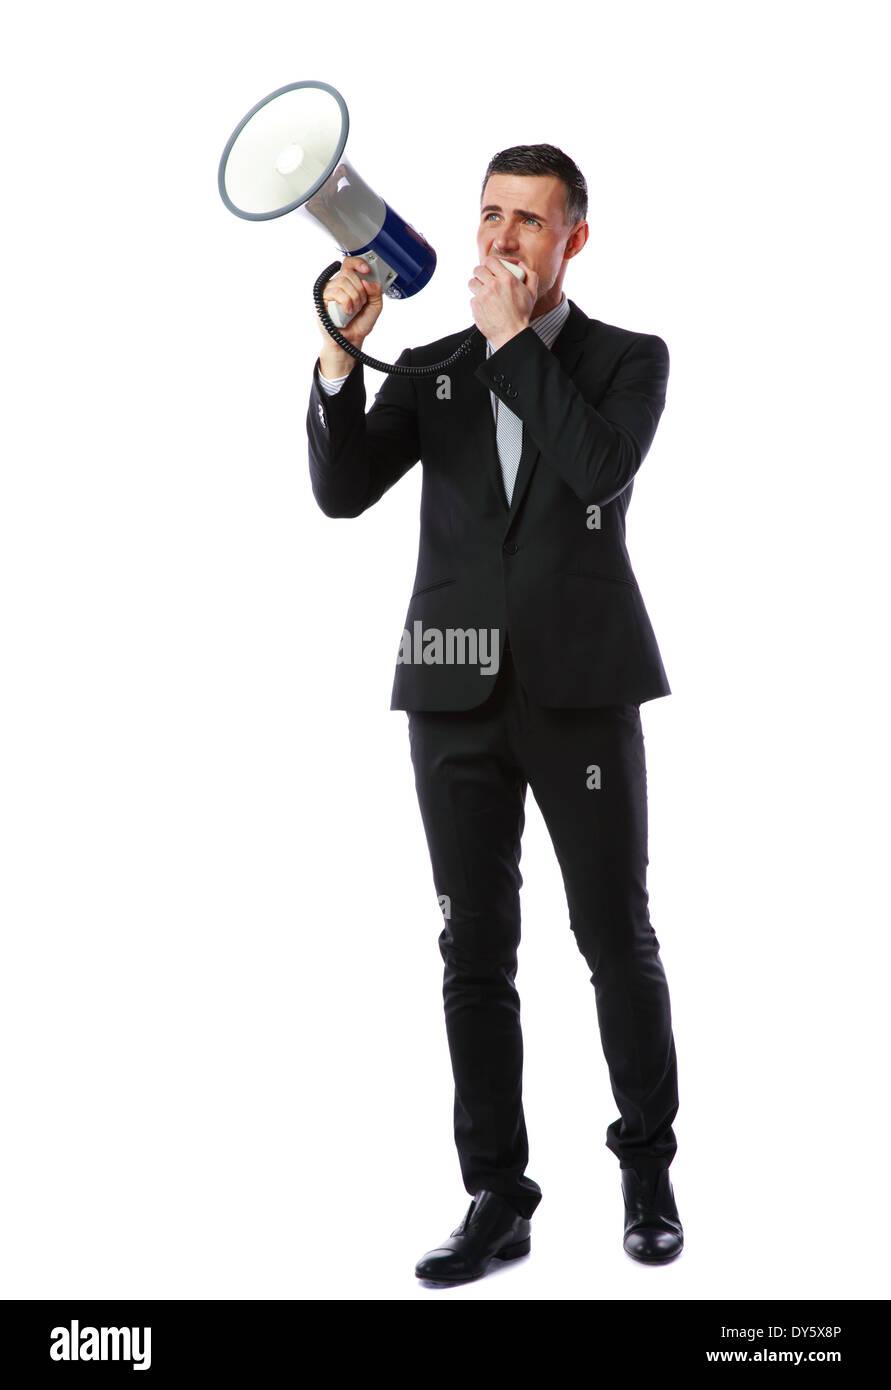 Full length portrait of businessman shout through megaphone isolated on white background - Stock Image